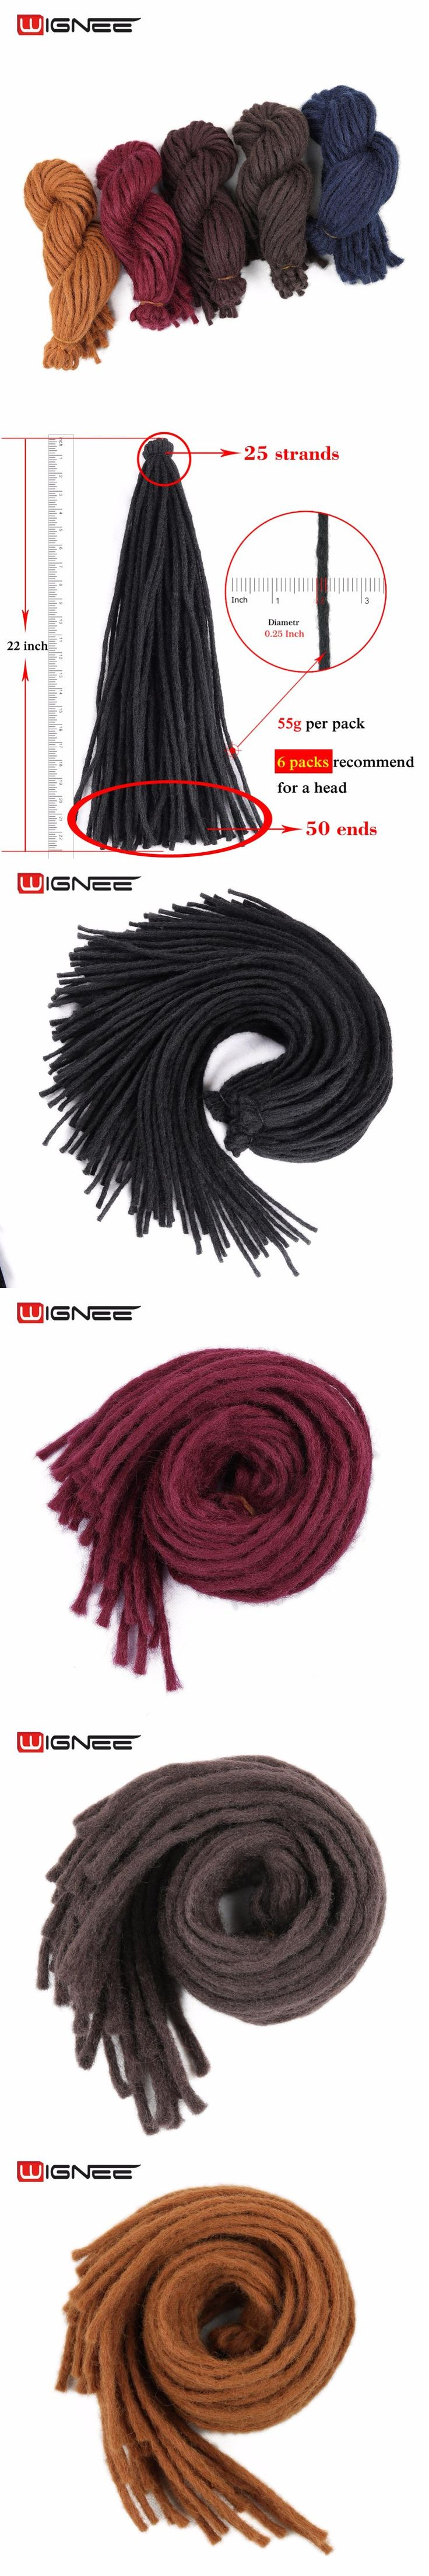 Wignee Dreadlock Hair Extension For Black Women High Temperature Synthetic Fiber Crochet Twist Braids Red /Brown/Grey/ Fake Hair